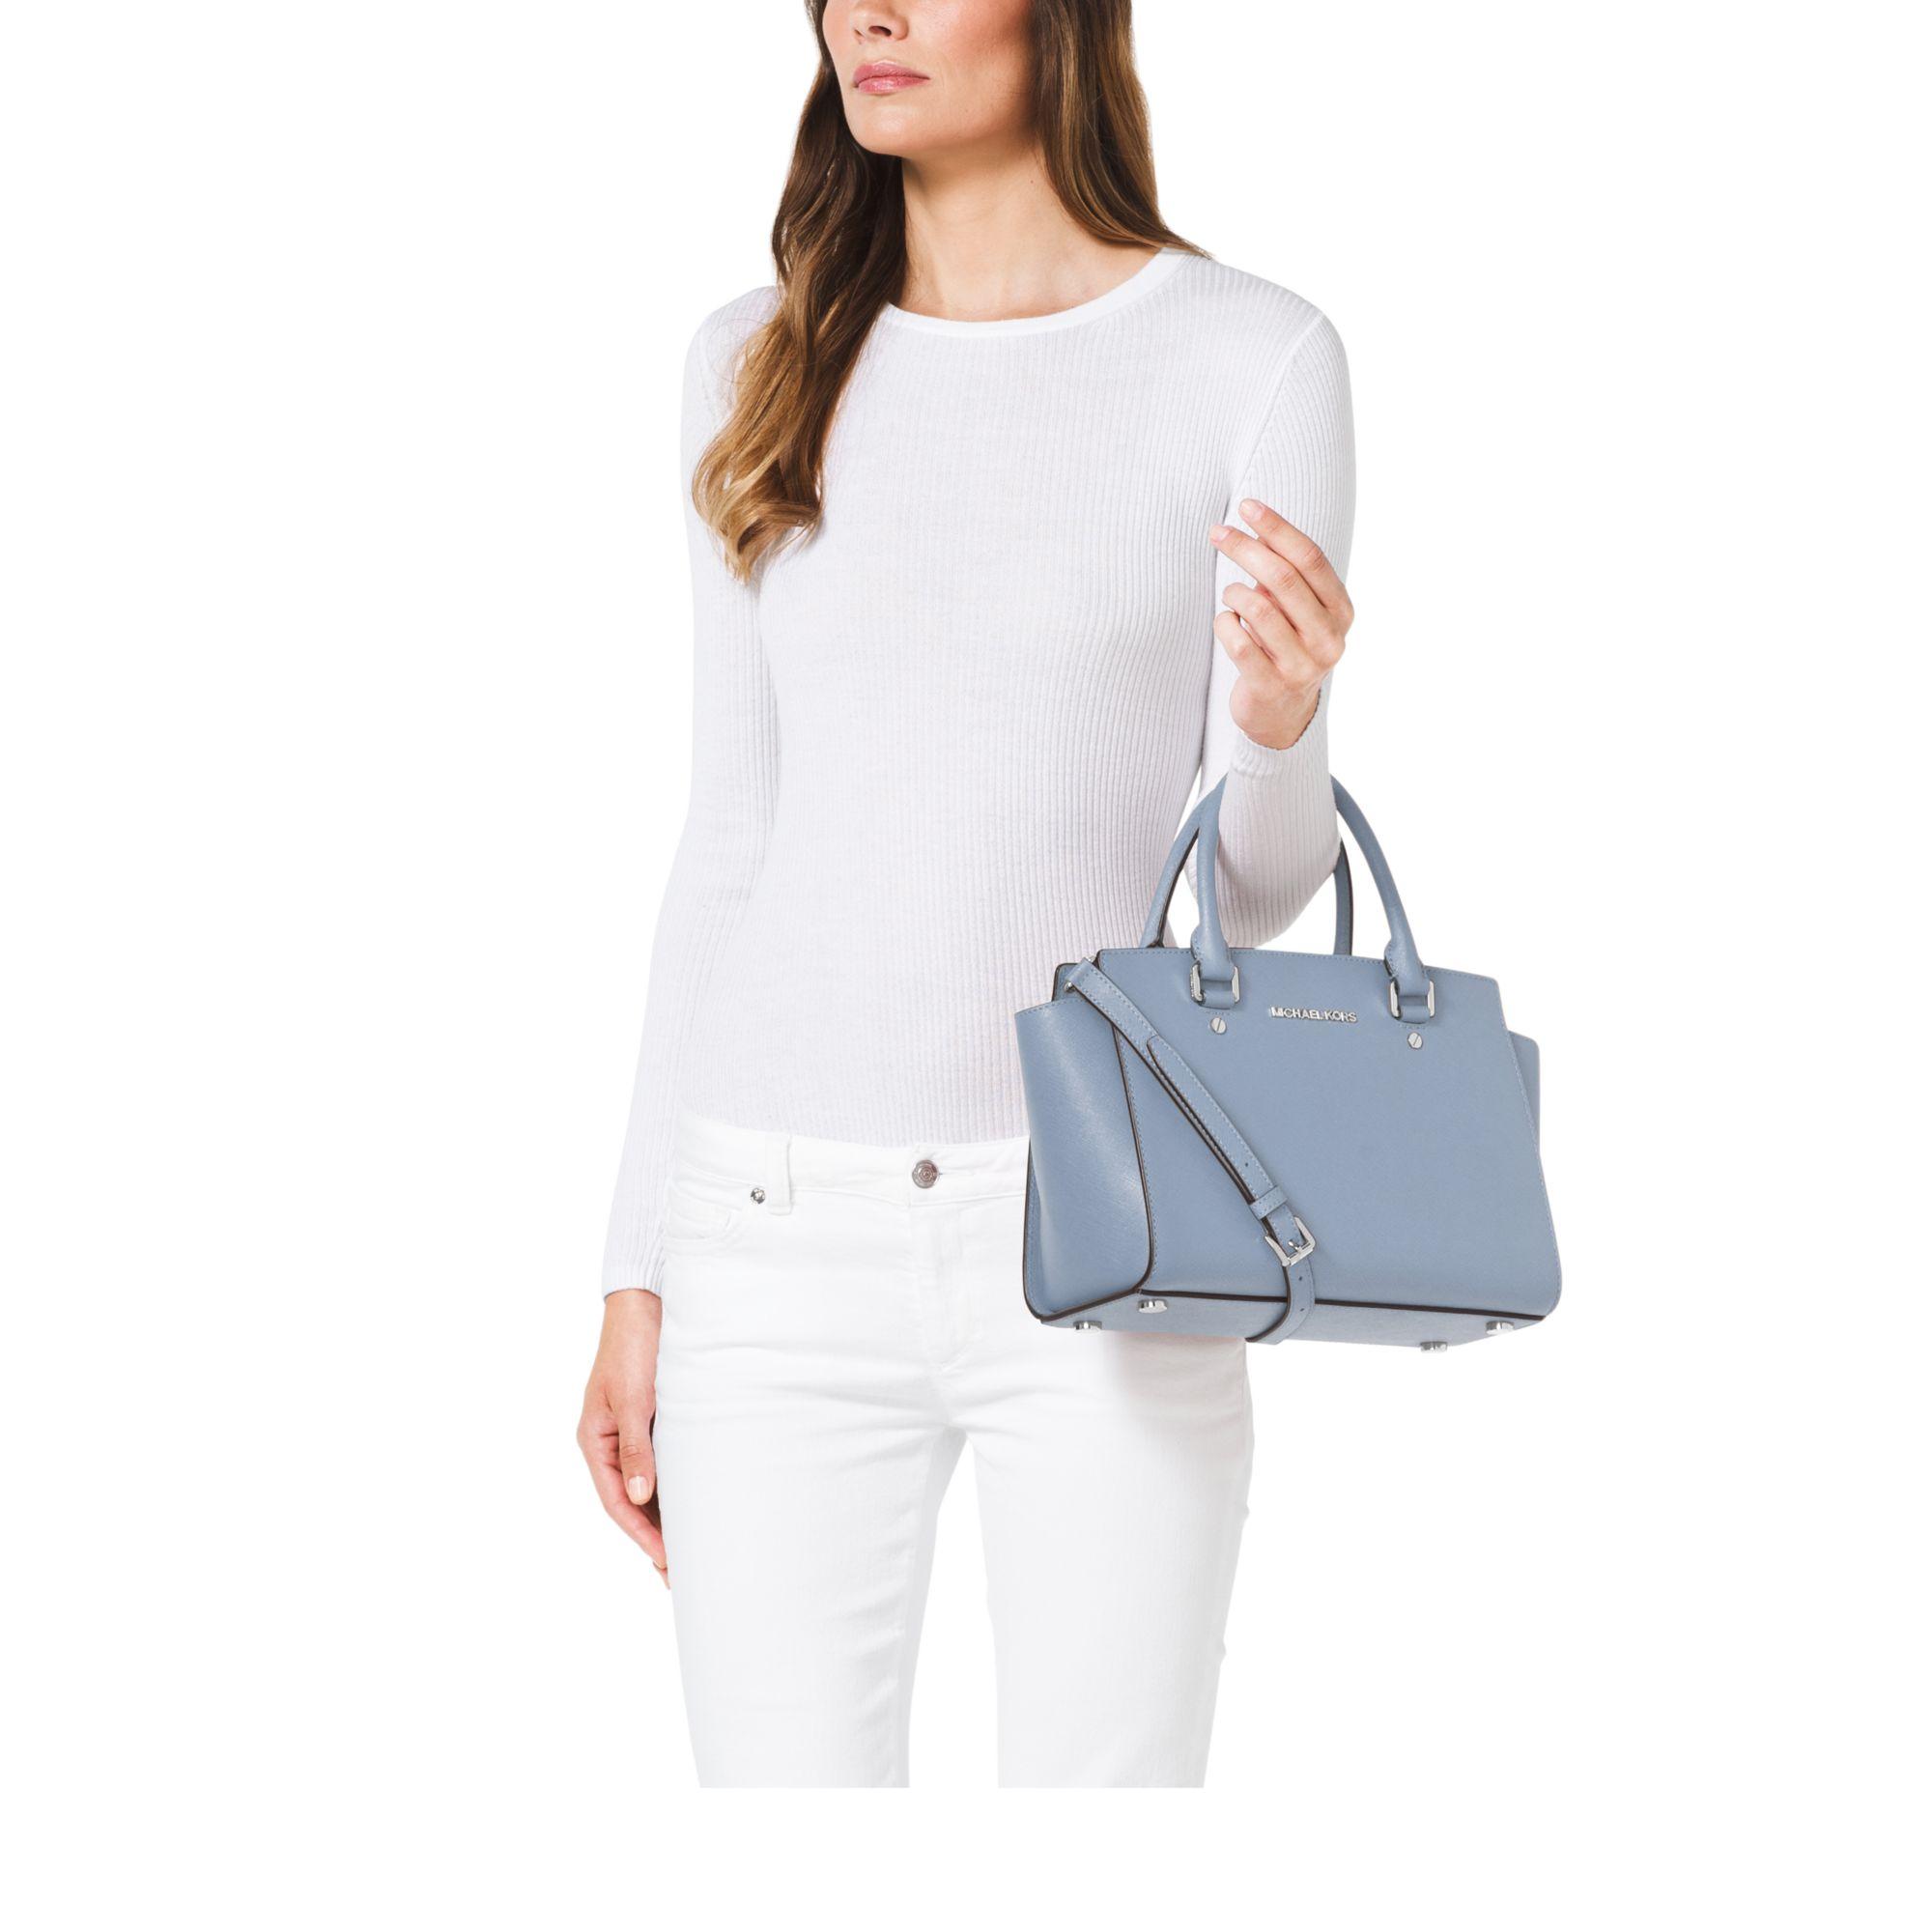 michael kors selma medium saffiano leather satchel in blue. Black Bedroom Furniture Sets. Home Design Ideas